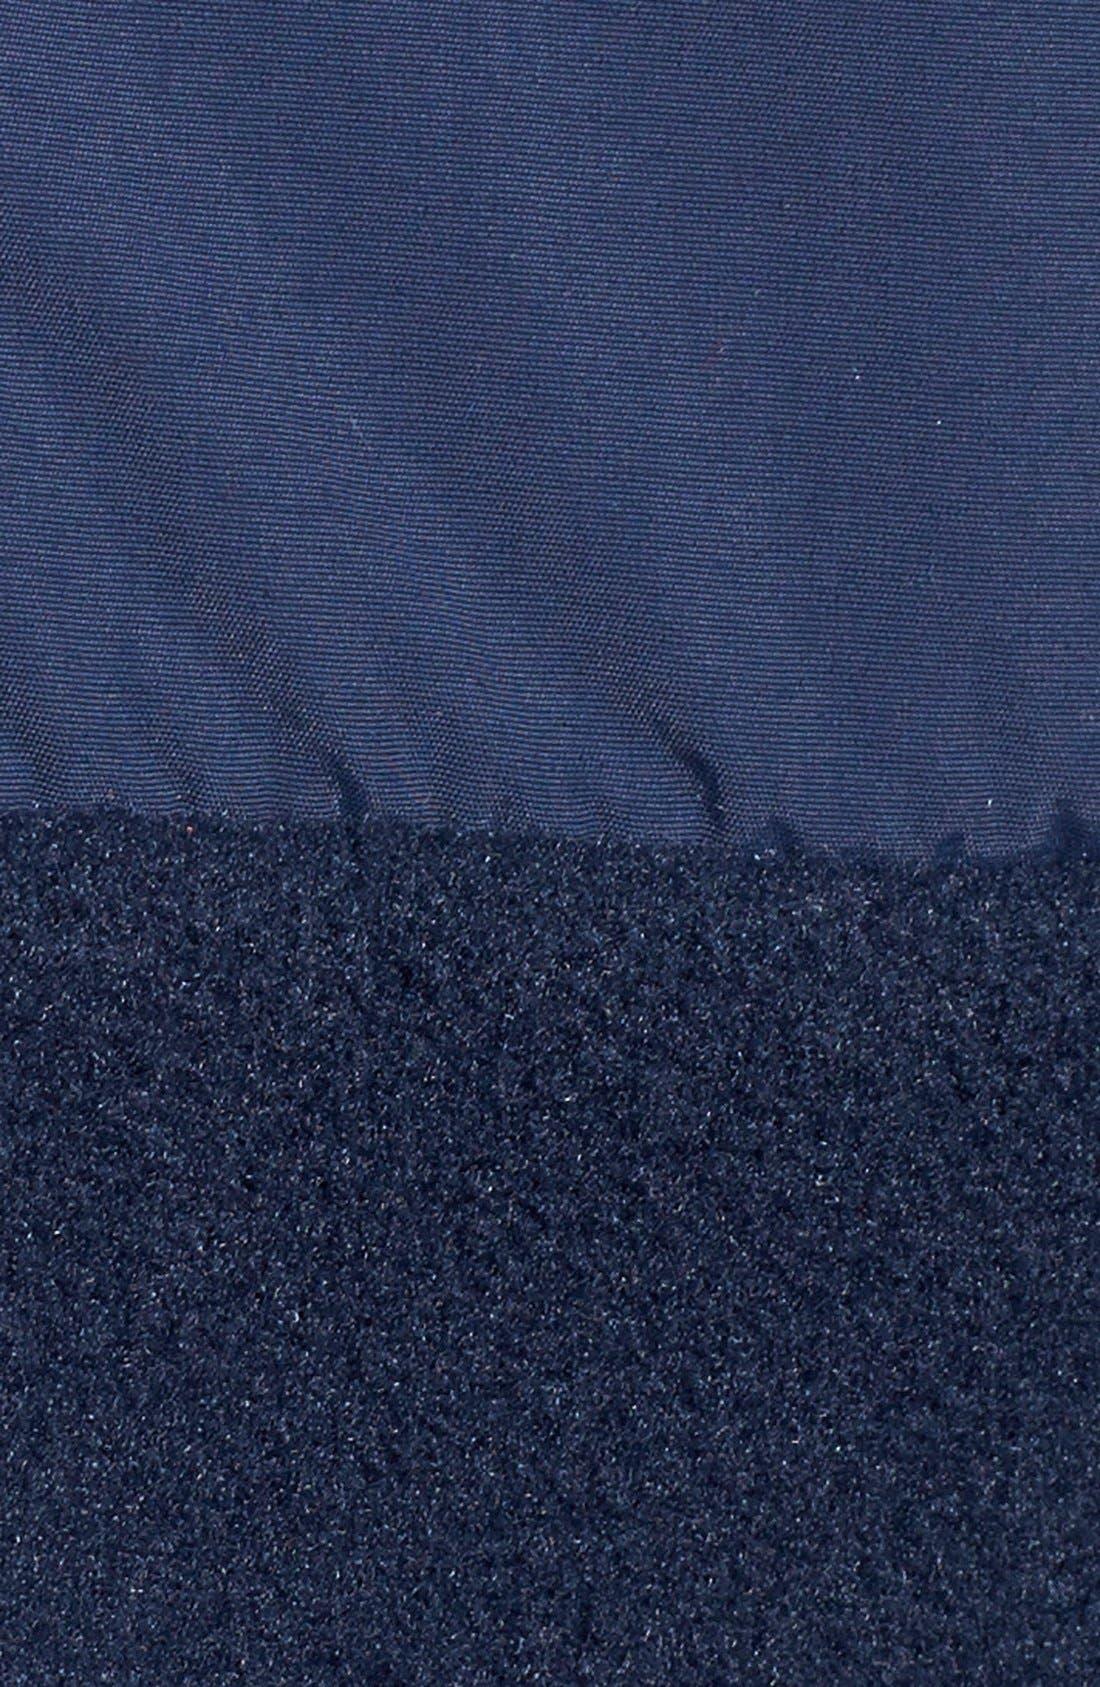 Alternate Image 5  - The North Face 'Denali' Recycled Polartec 300® Fleece Jacket